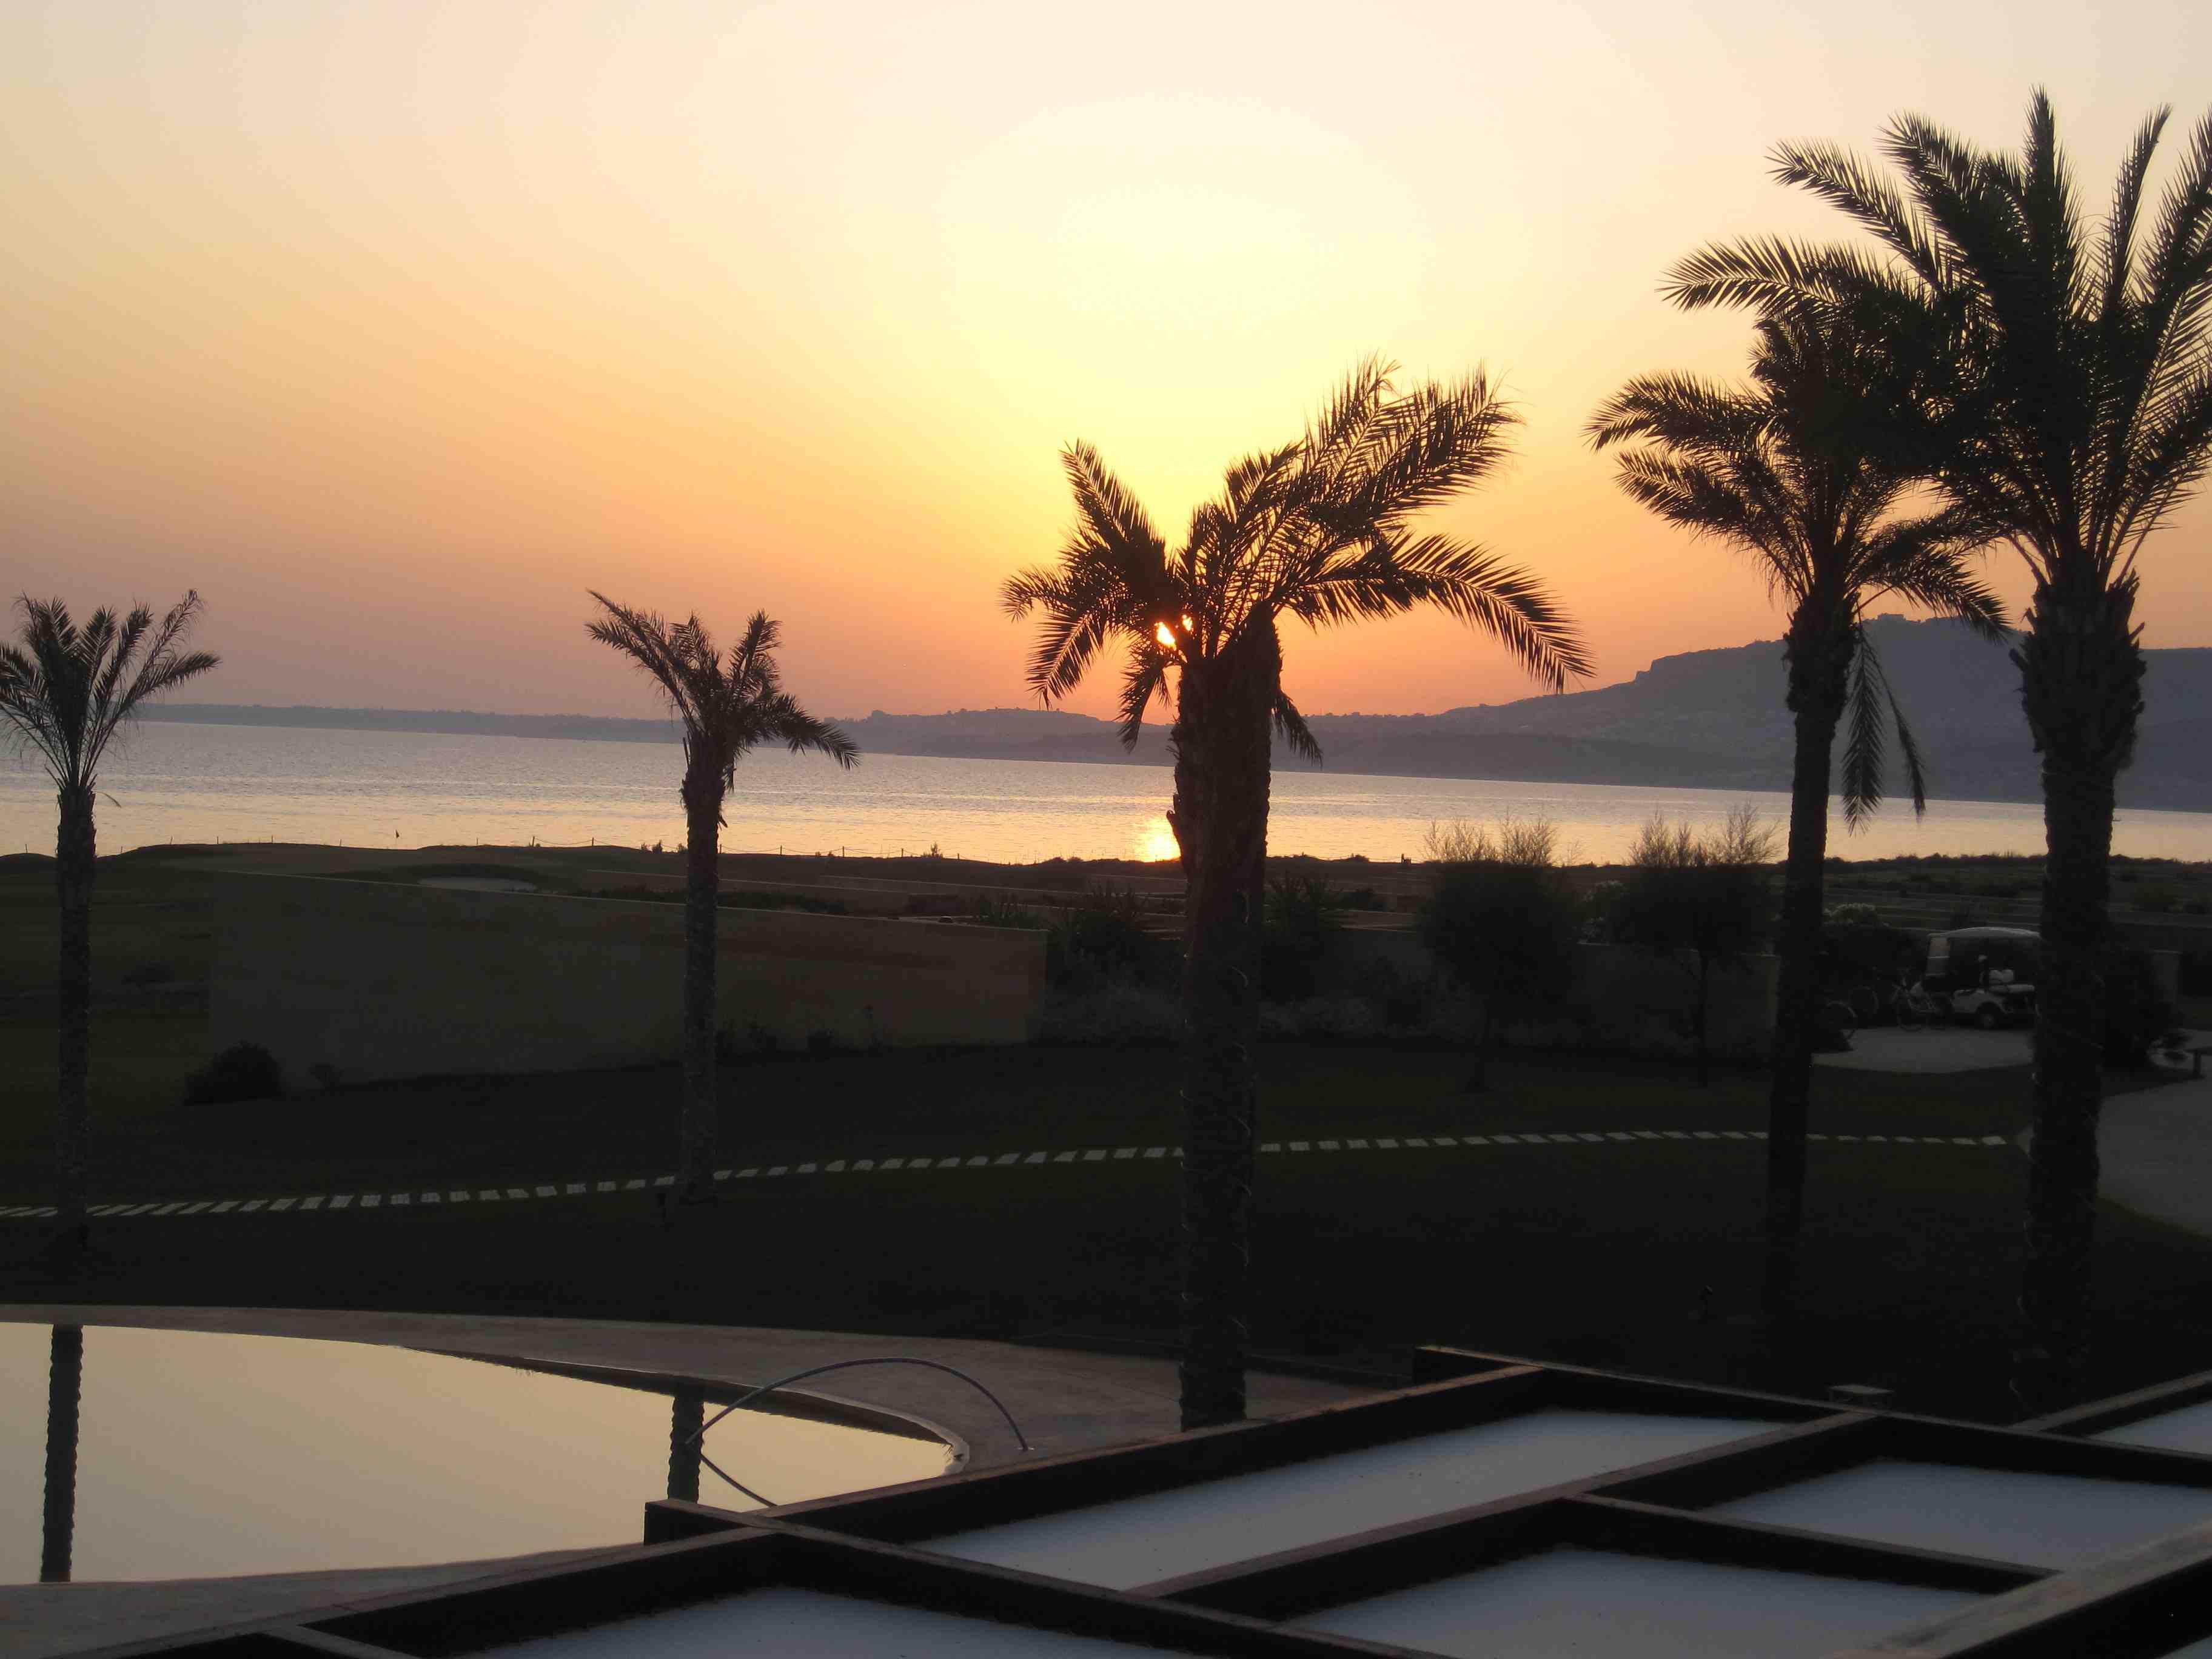 2011-07-18-sunset.jpg